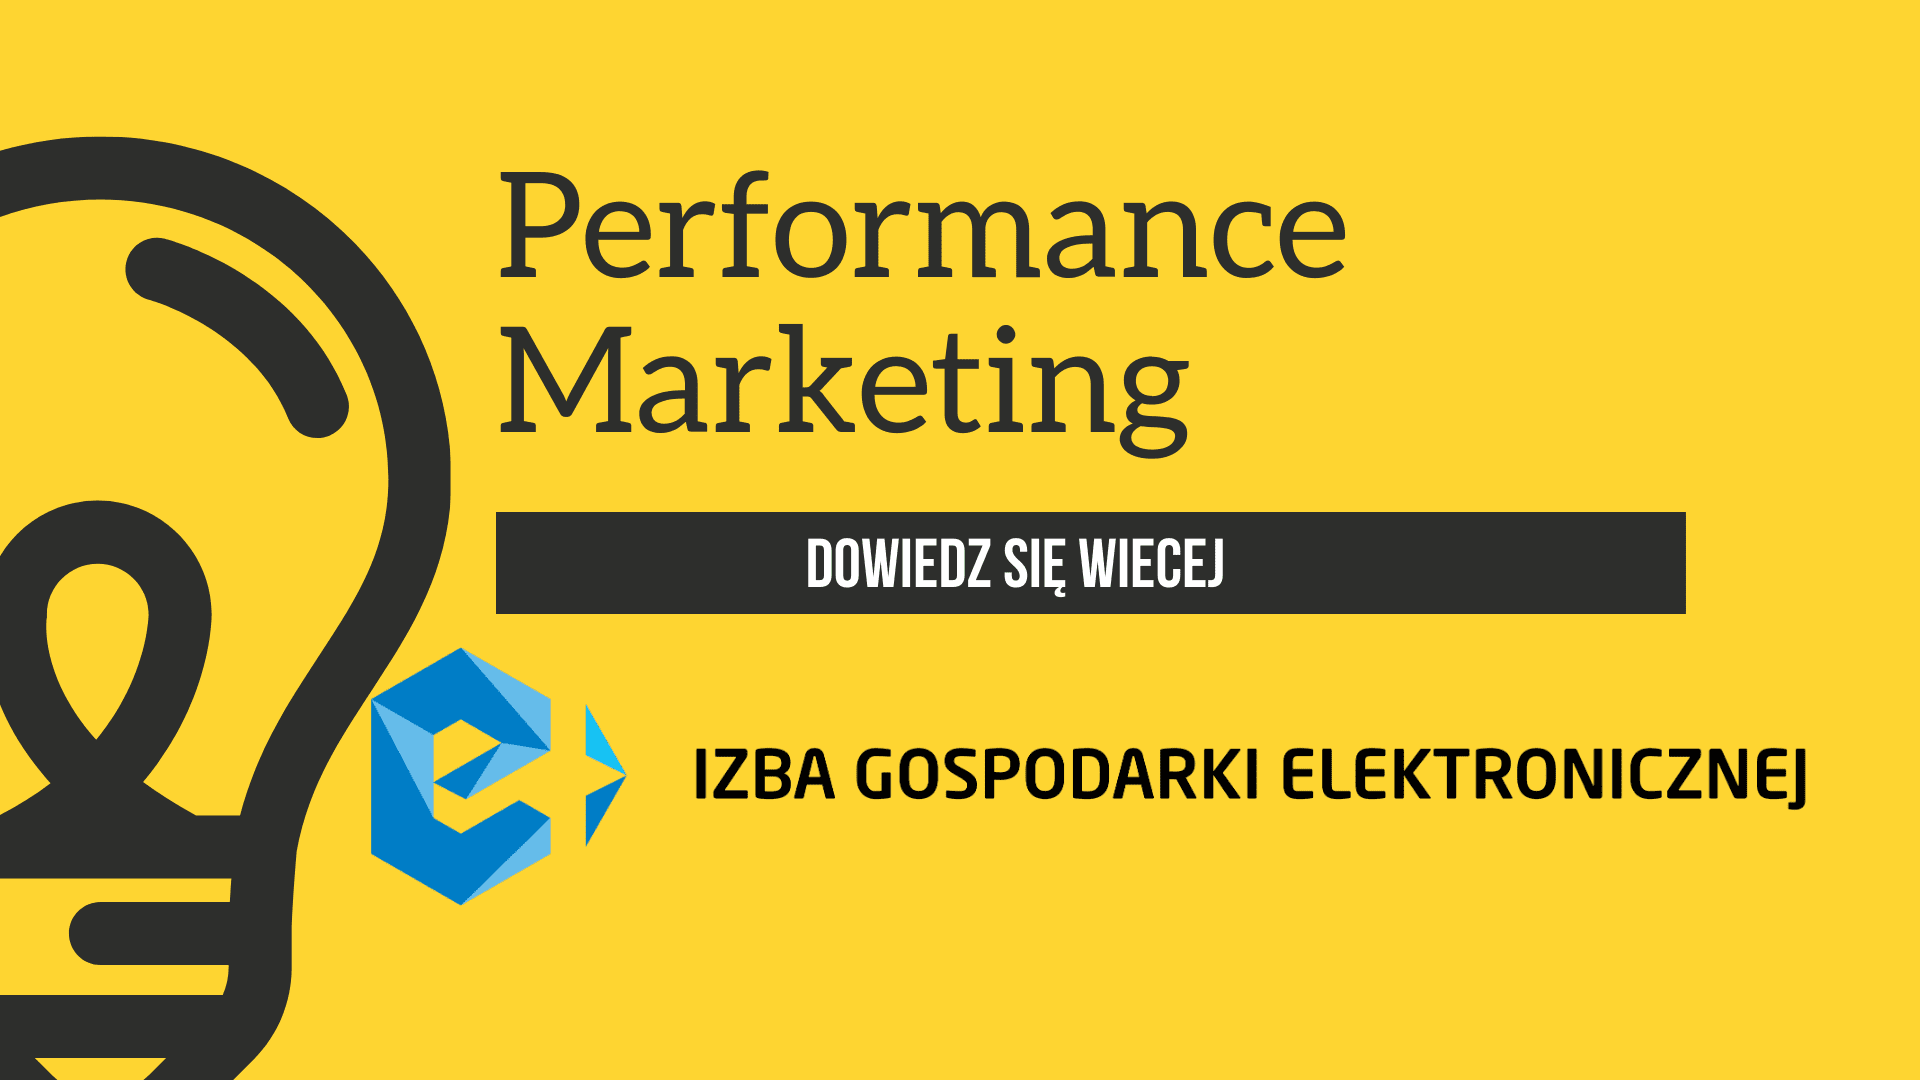 e-Izba edukuje z performance marketingu!